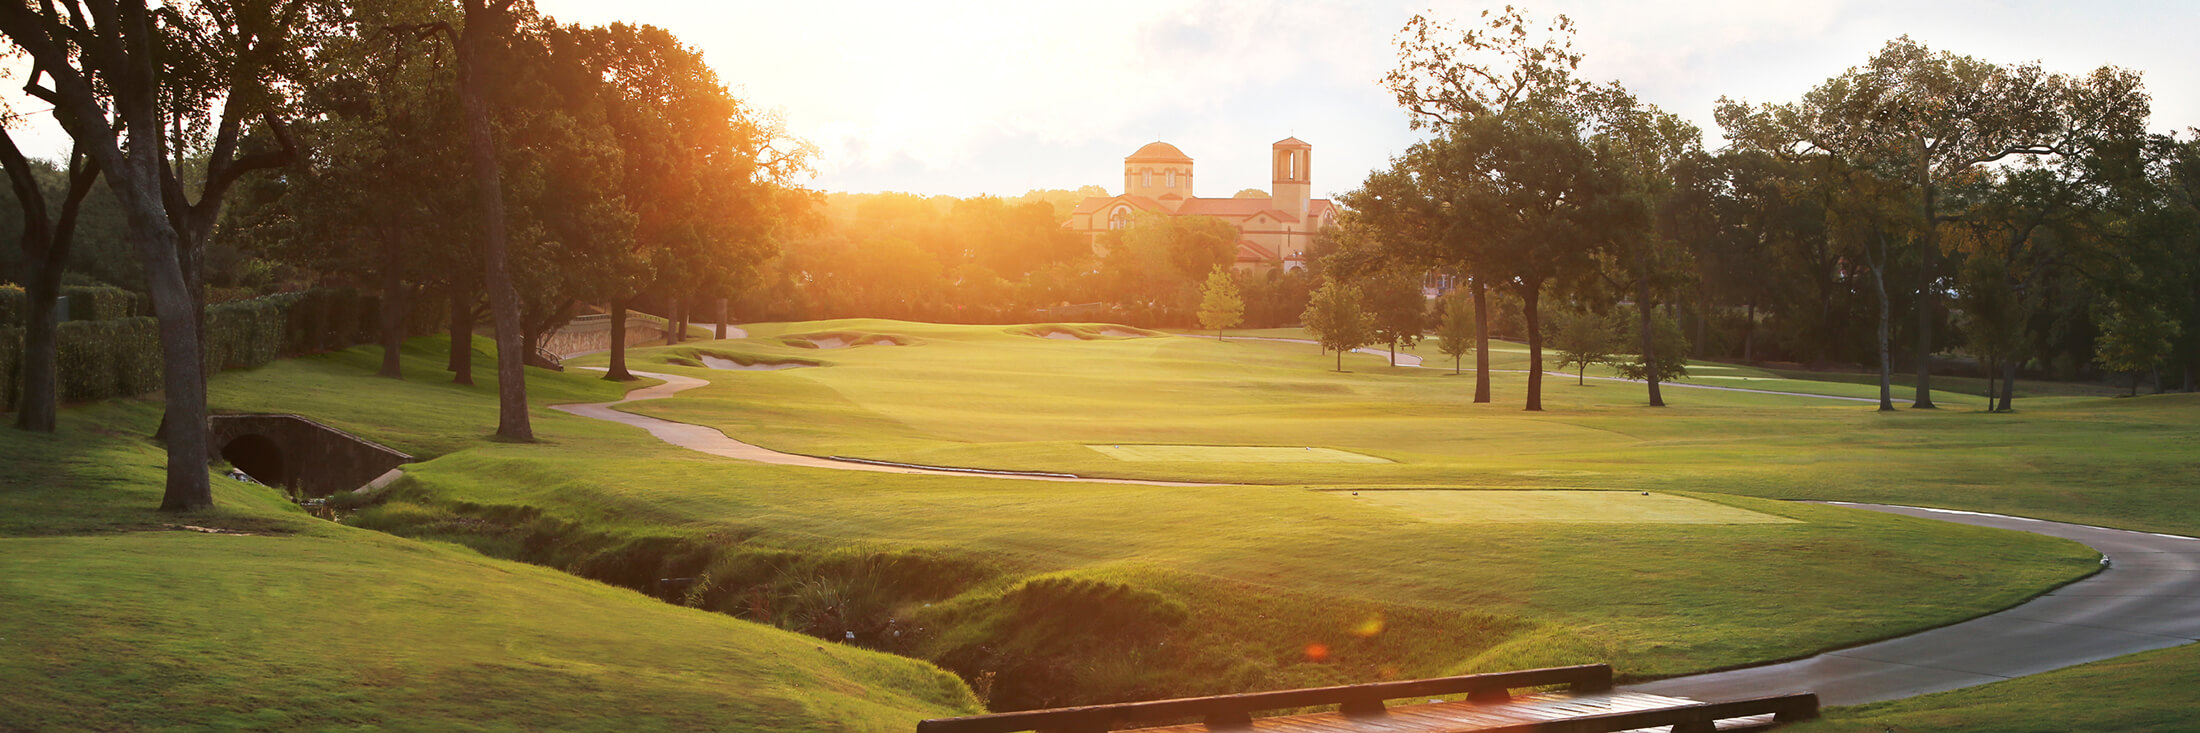 Golf Course Image - Northwood Club No. 1